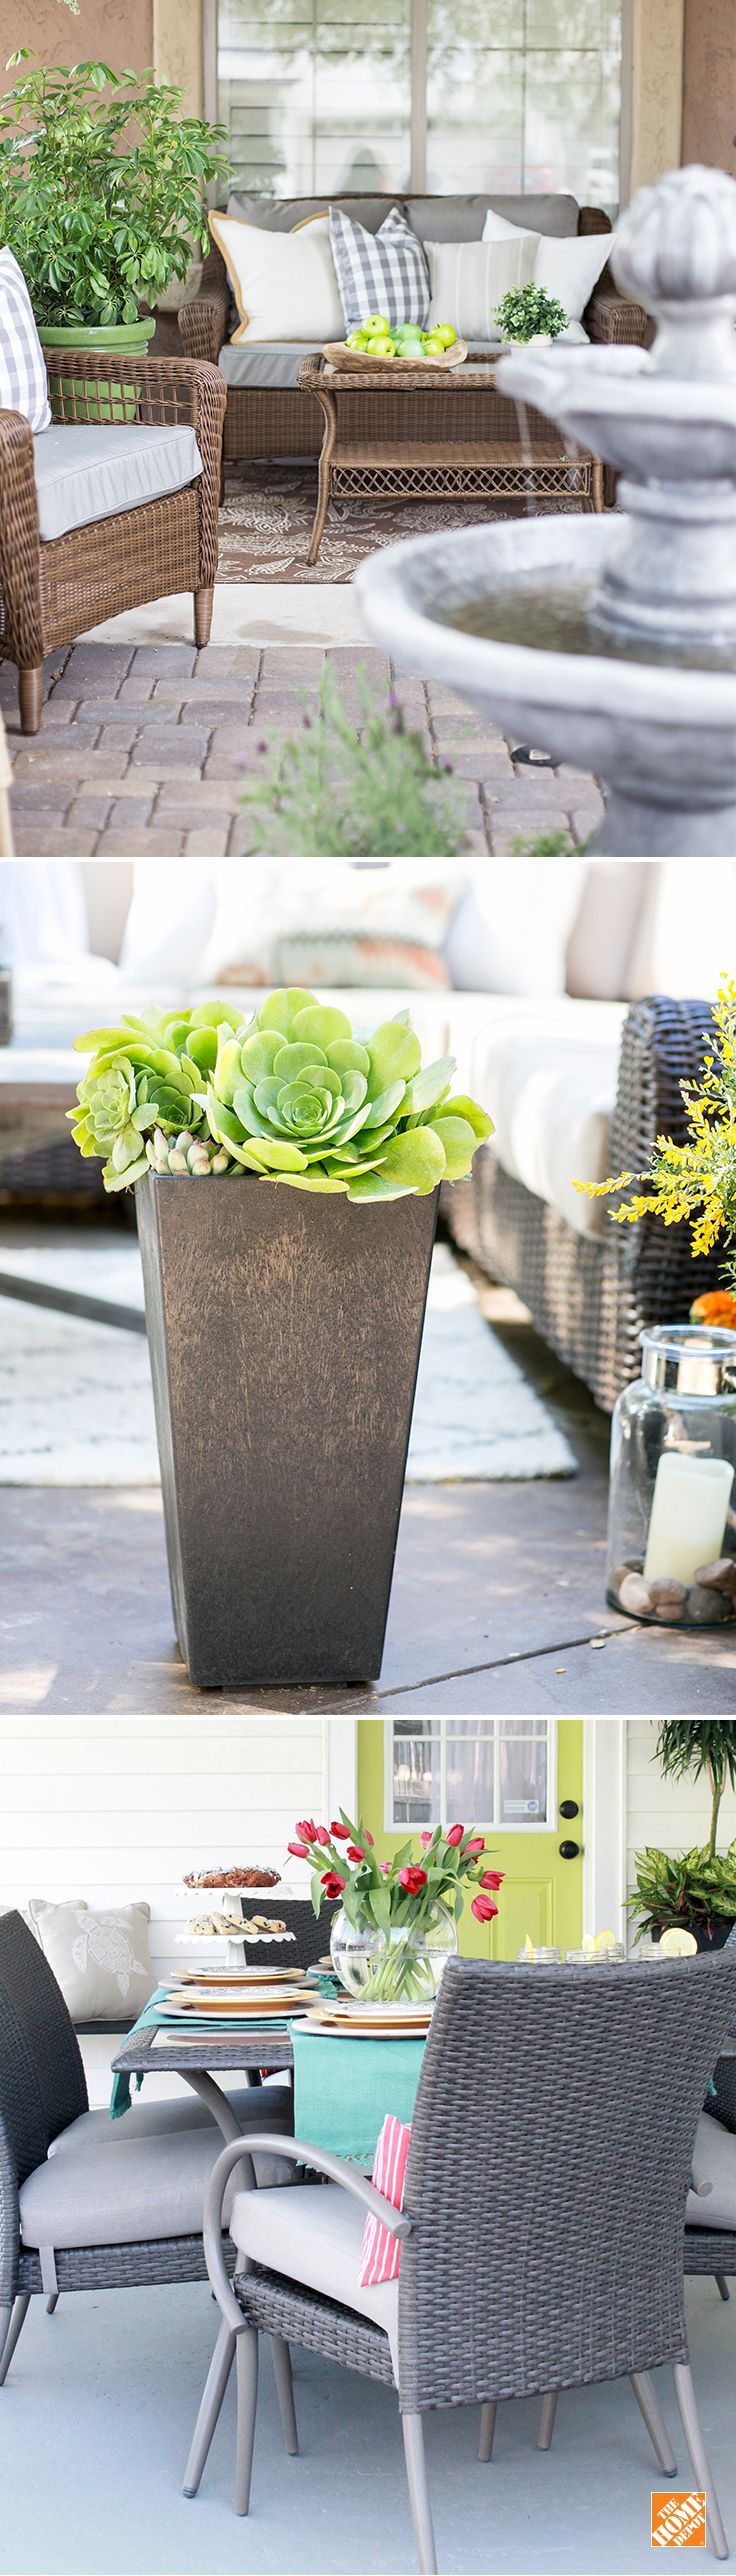 17 Best images about Garden Club – Home Depot Garden Plants